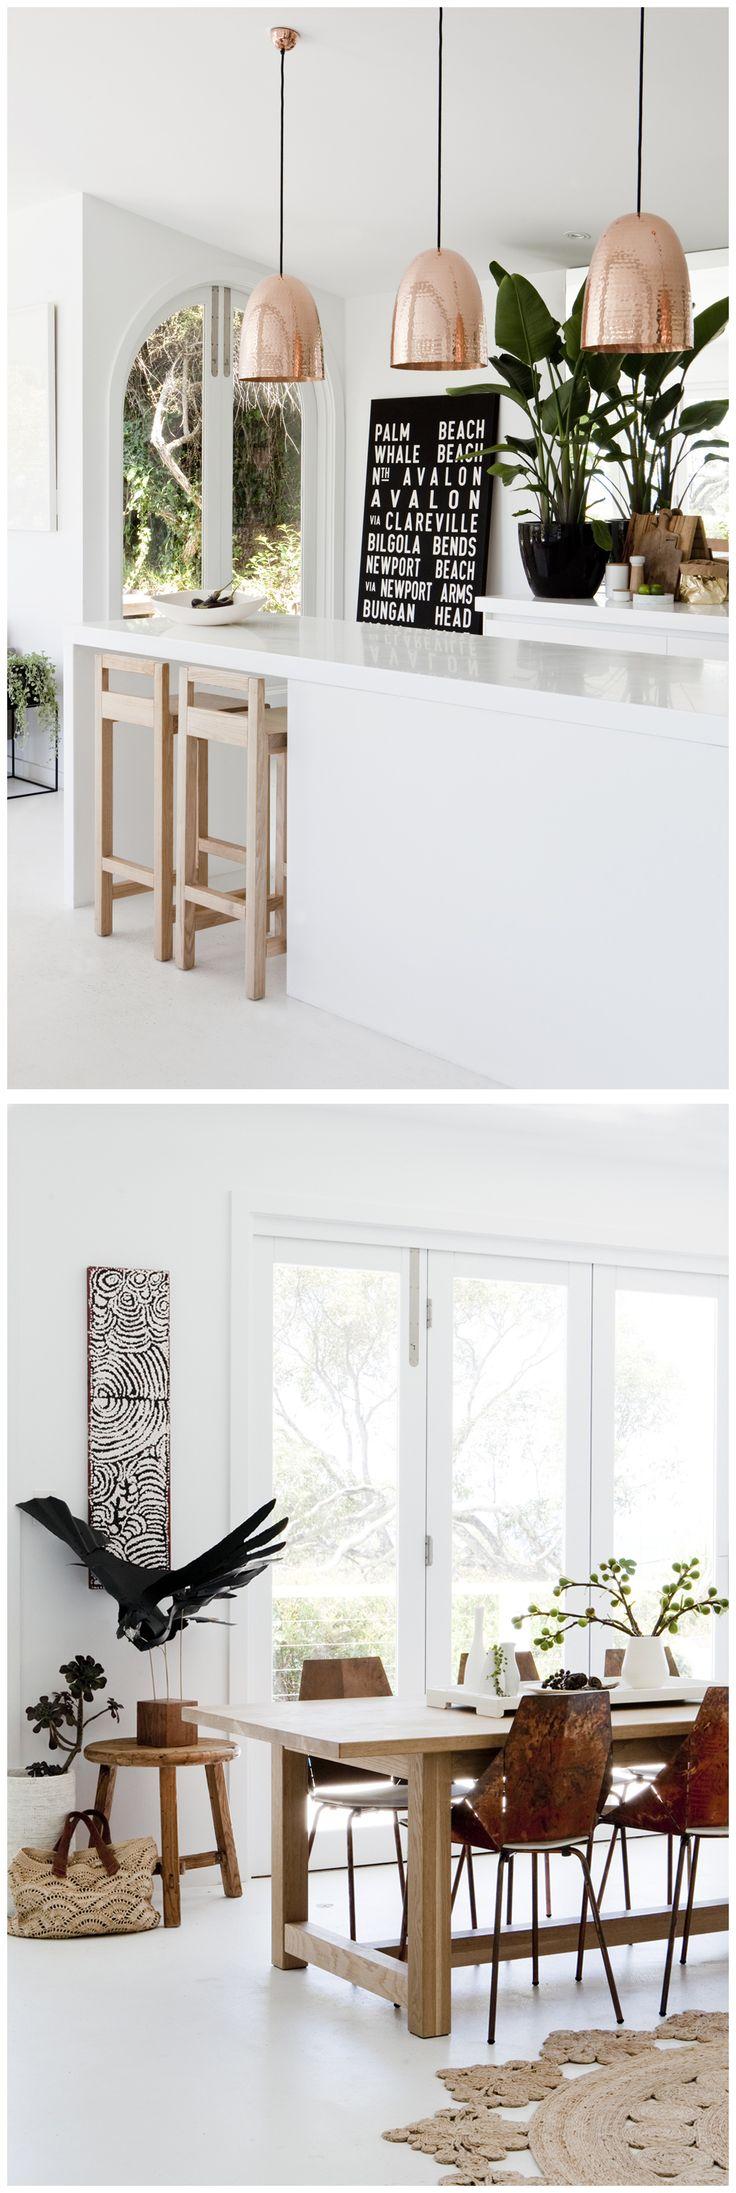 best home images on pinterest bedroom ideas apartment ideas